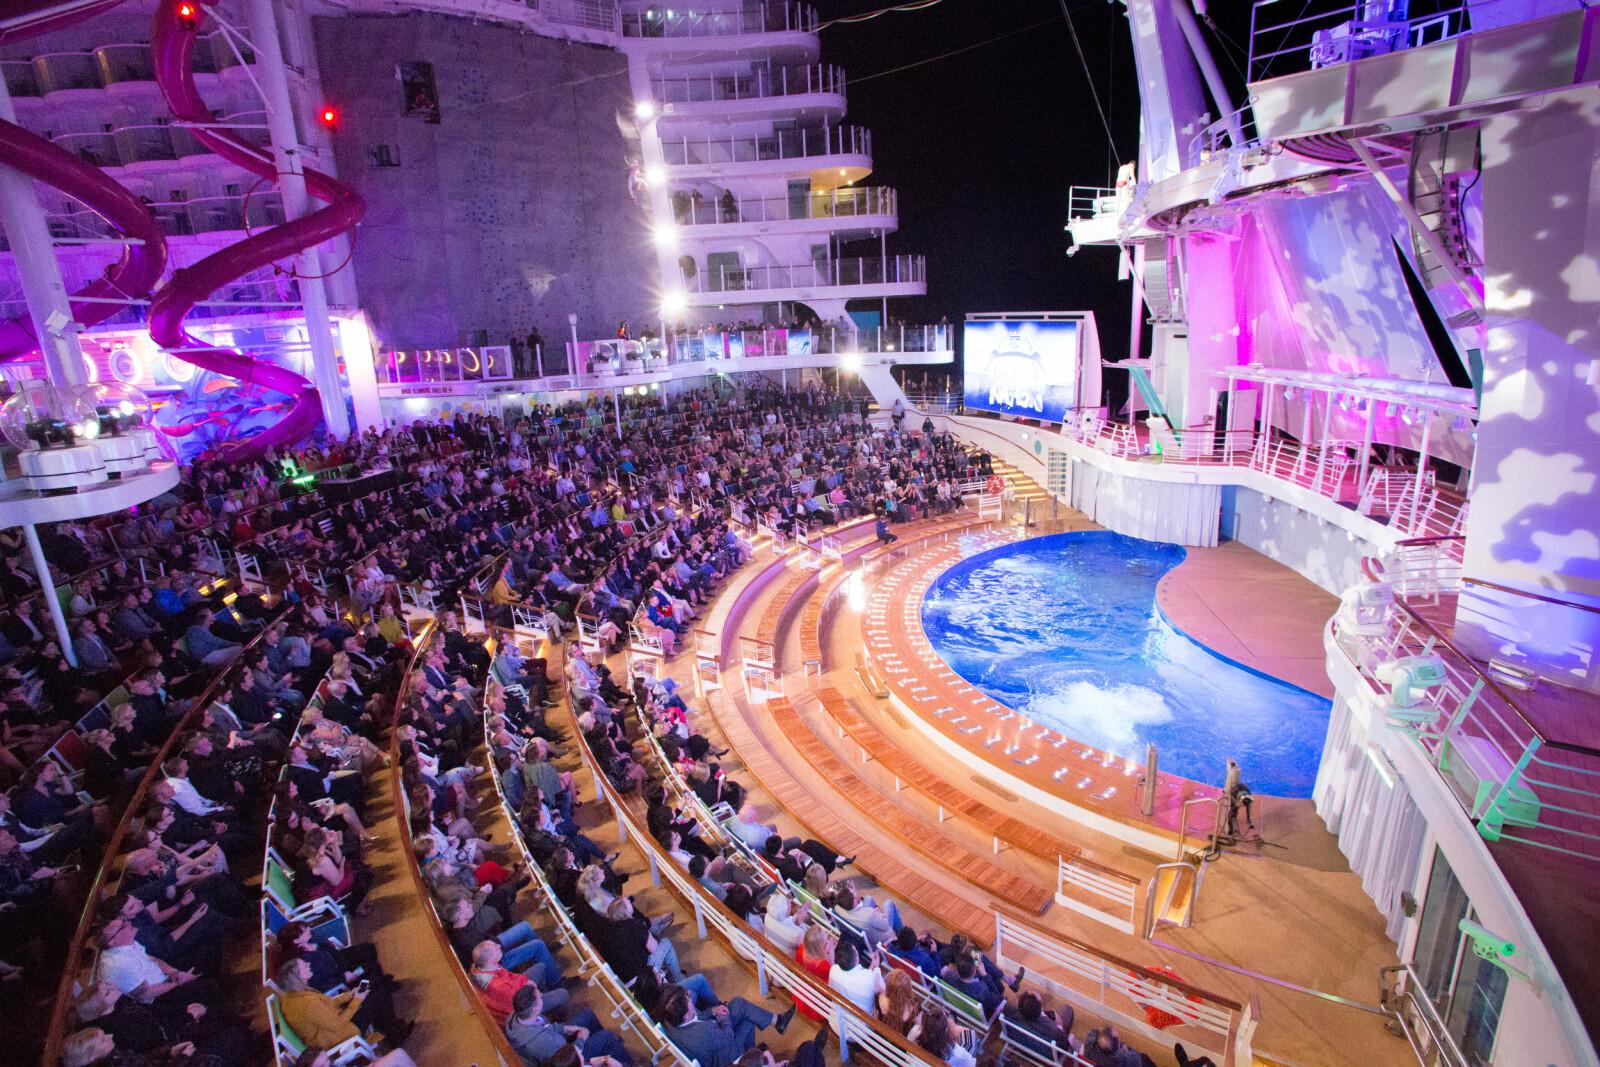 <b>TEATER:</b> Akter ligger også The Aqua Theatre.